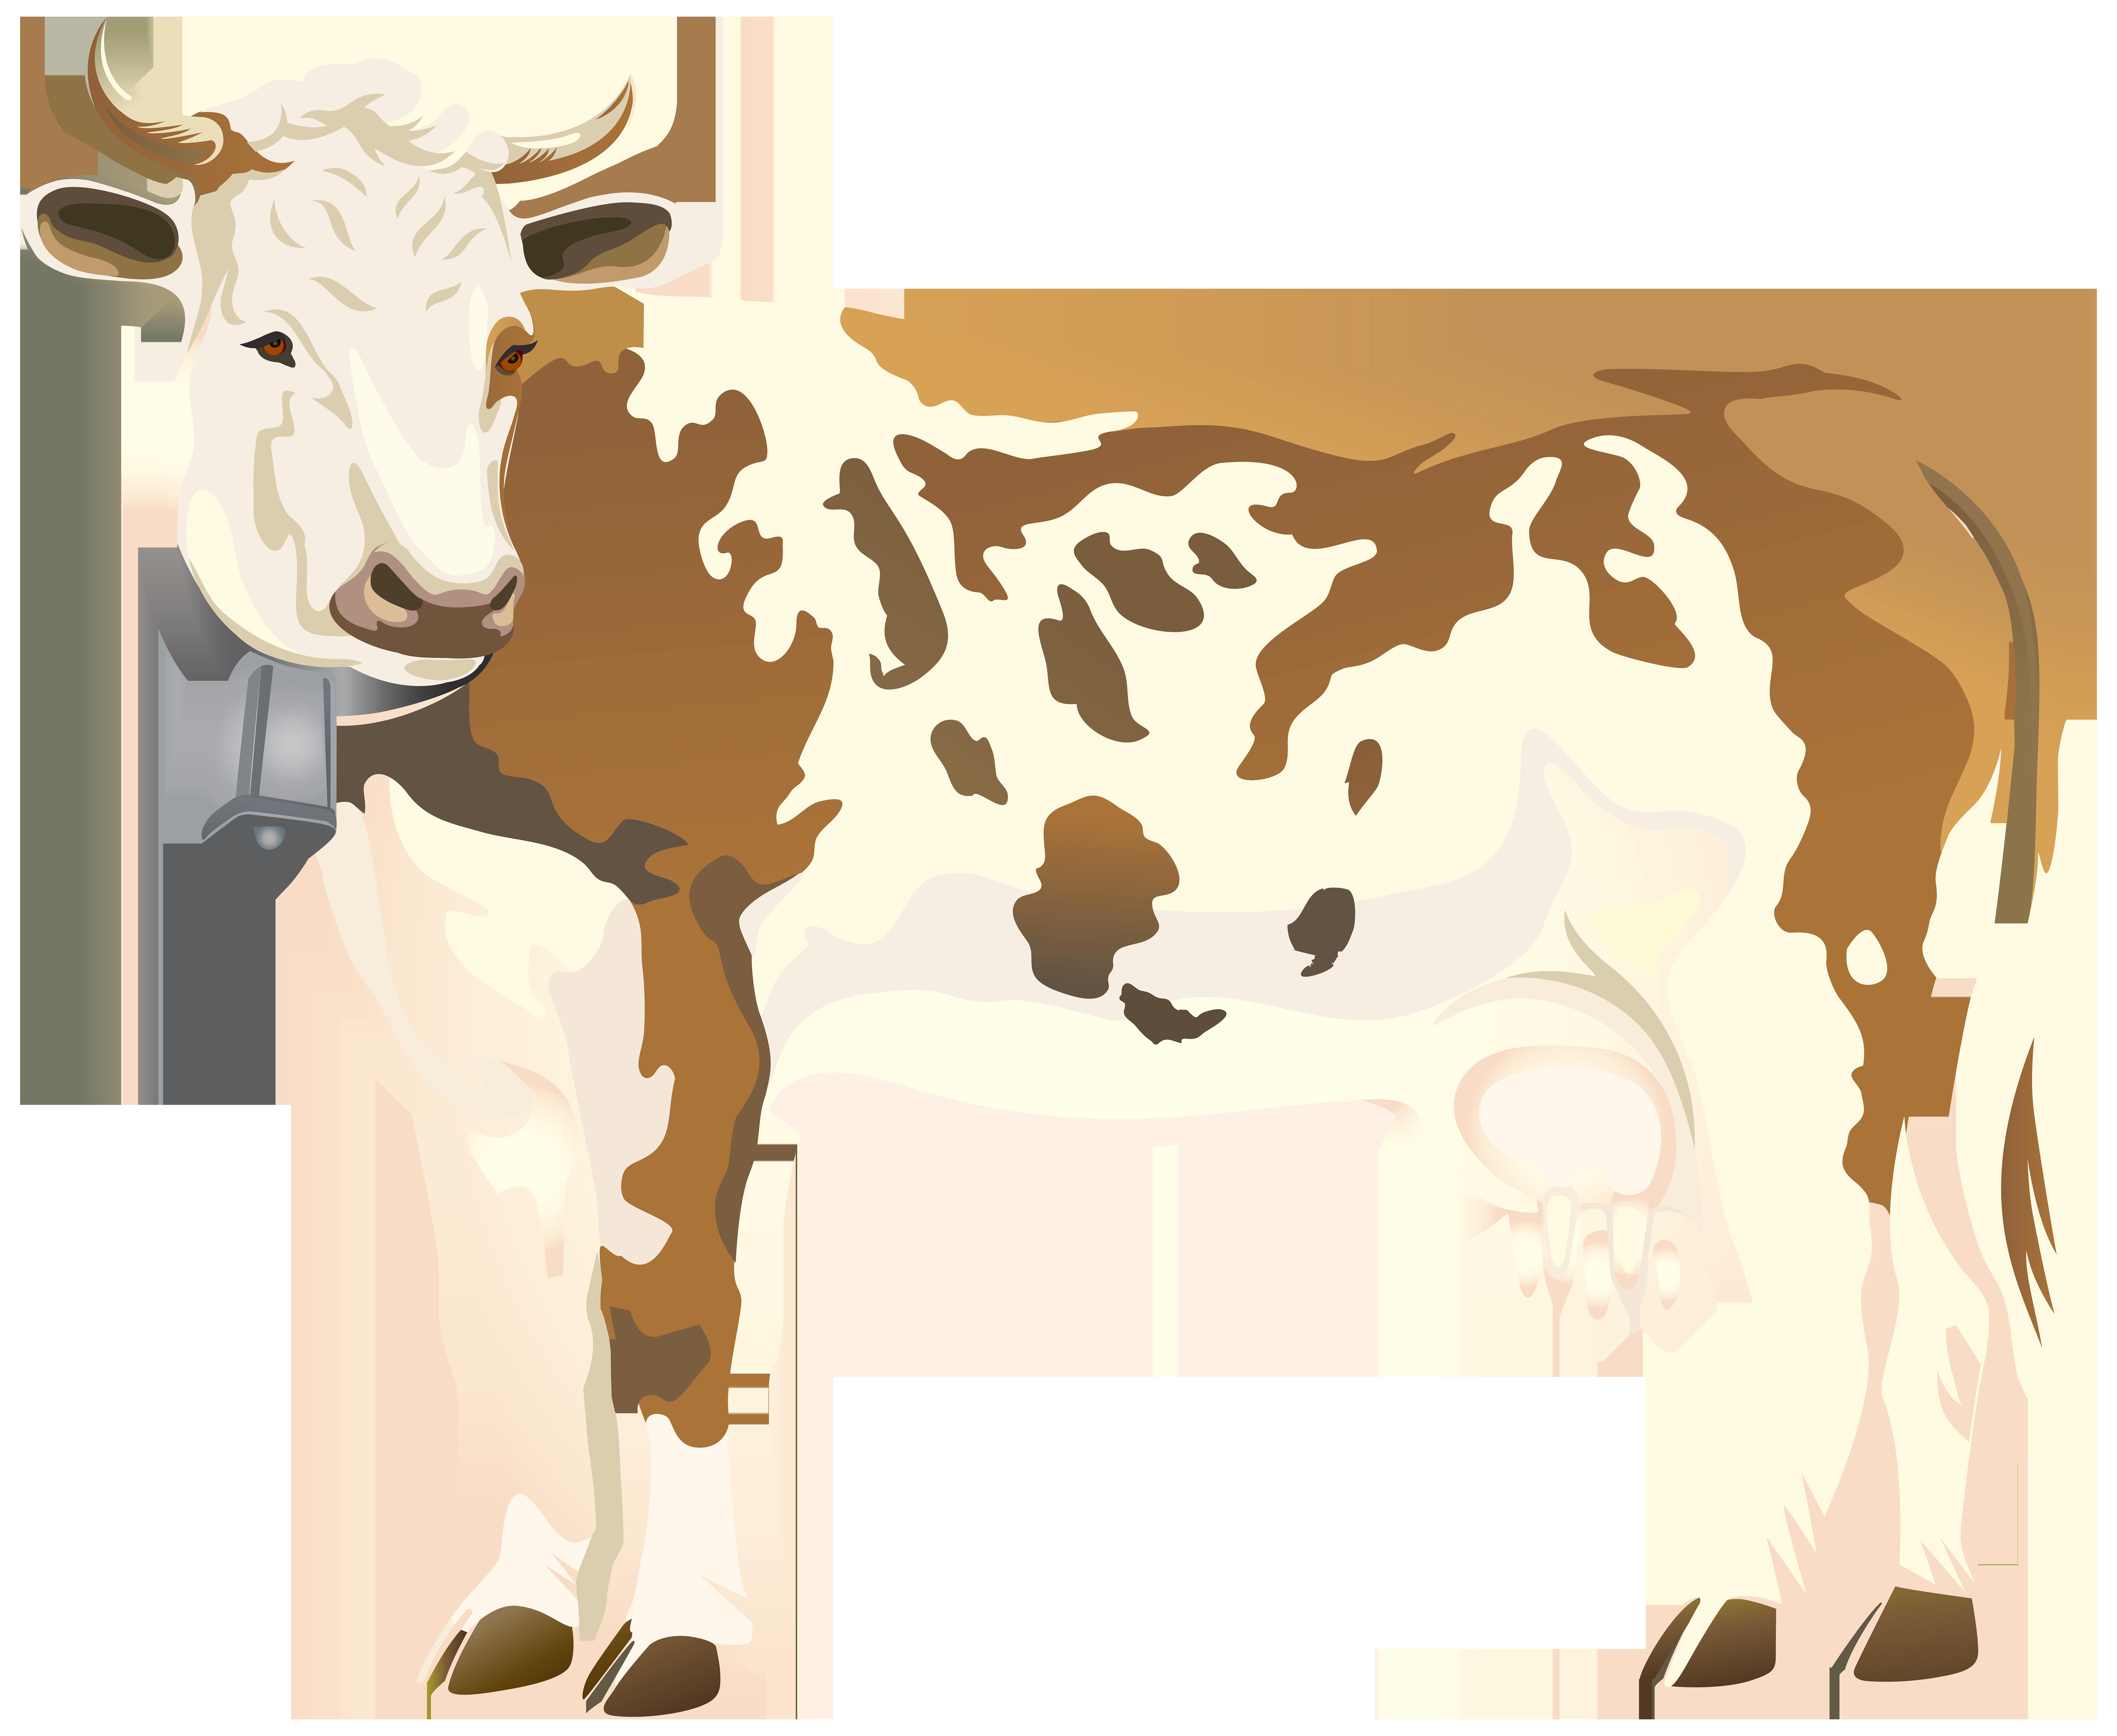 Png clip art image. Cow clipart gold